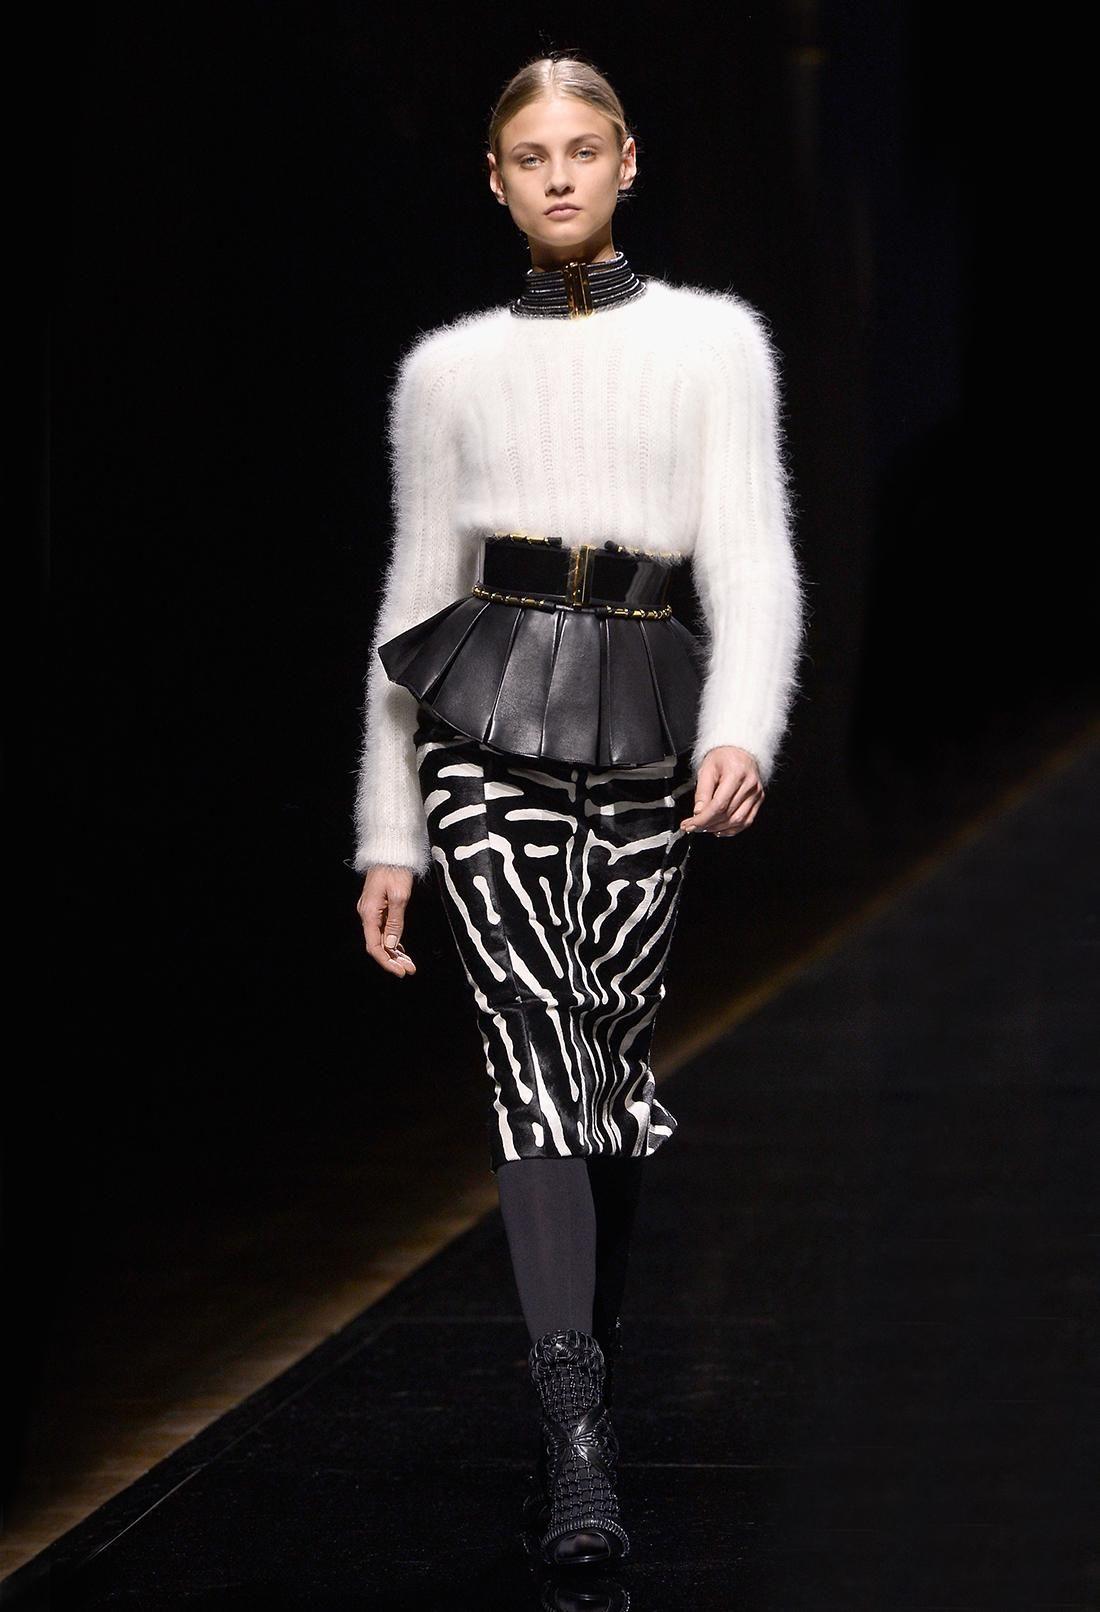 Rachel Zoe's Favorite Runway Looks: Paris Edition Definitely influenced by A McQueen